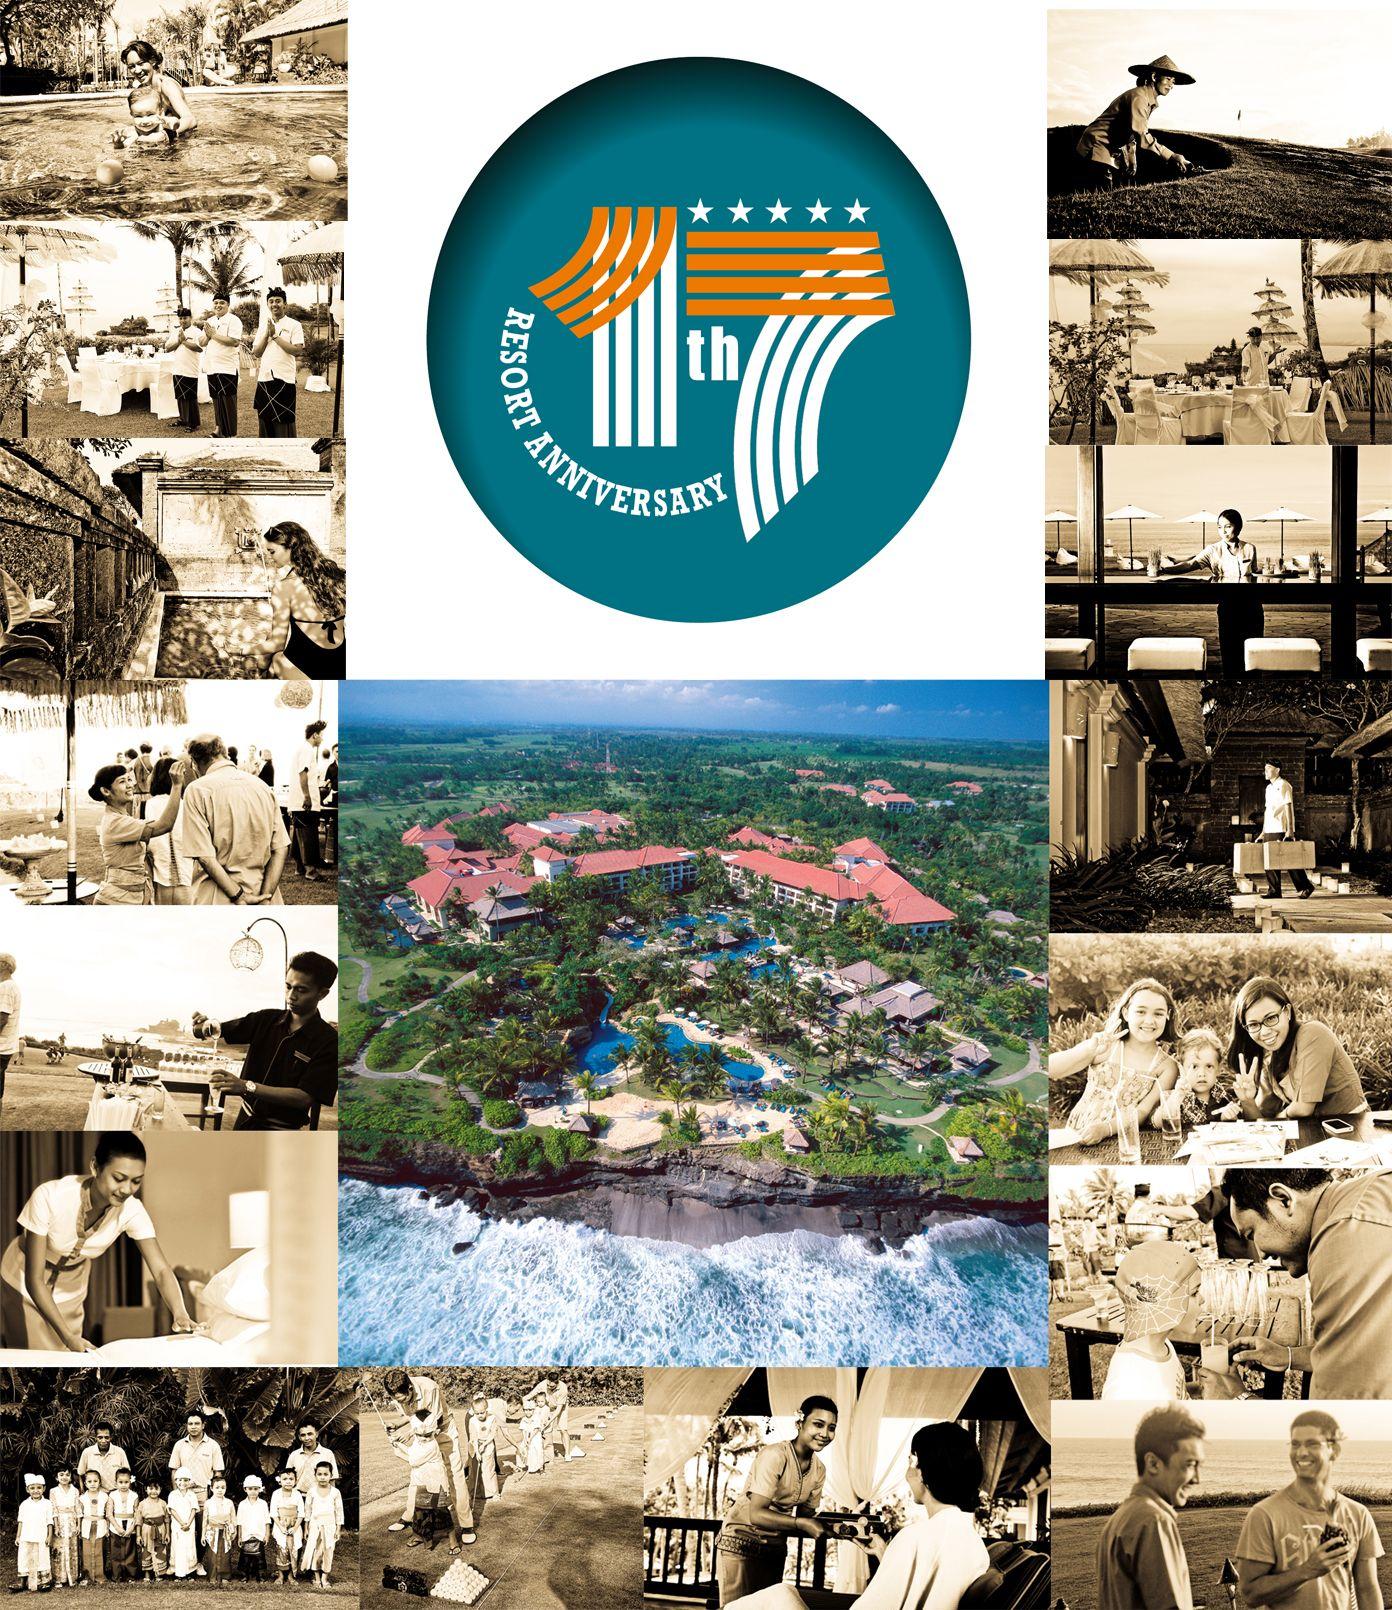 """17 years of Collaboration. Keep Moving Forward""   #PanPacificBali #Bali #Resort #TanahLot #Anniversary #SweetSeventeen #Celebration"